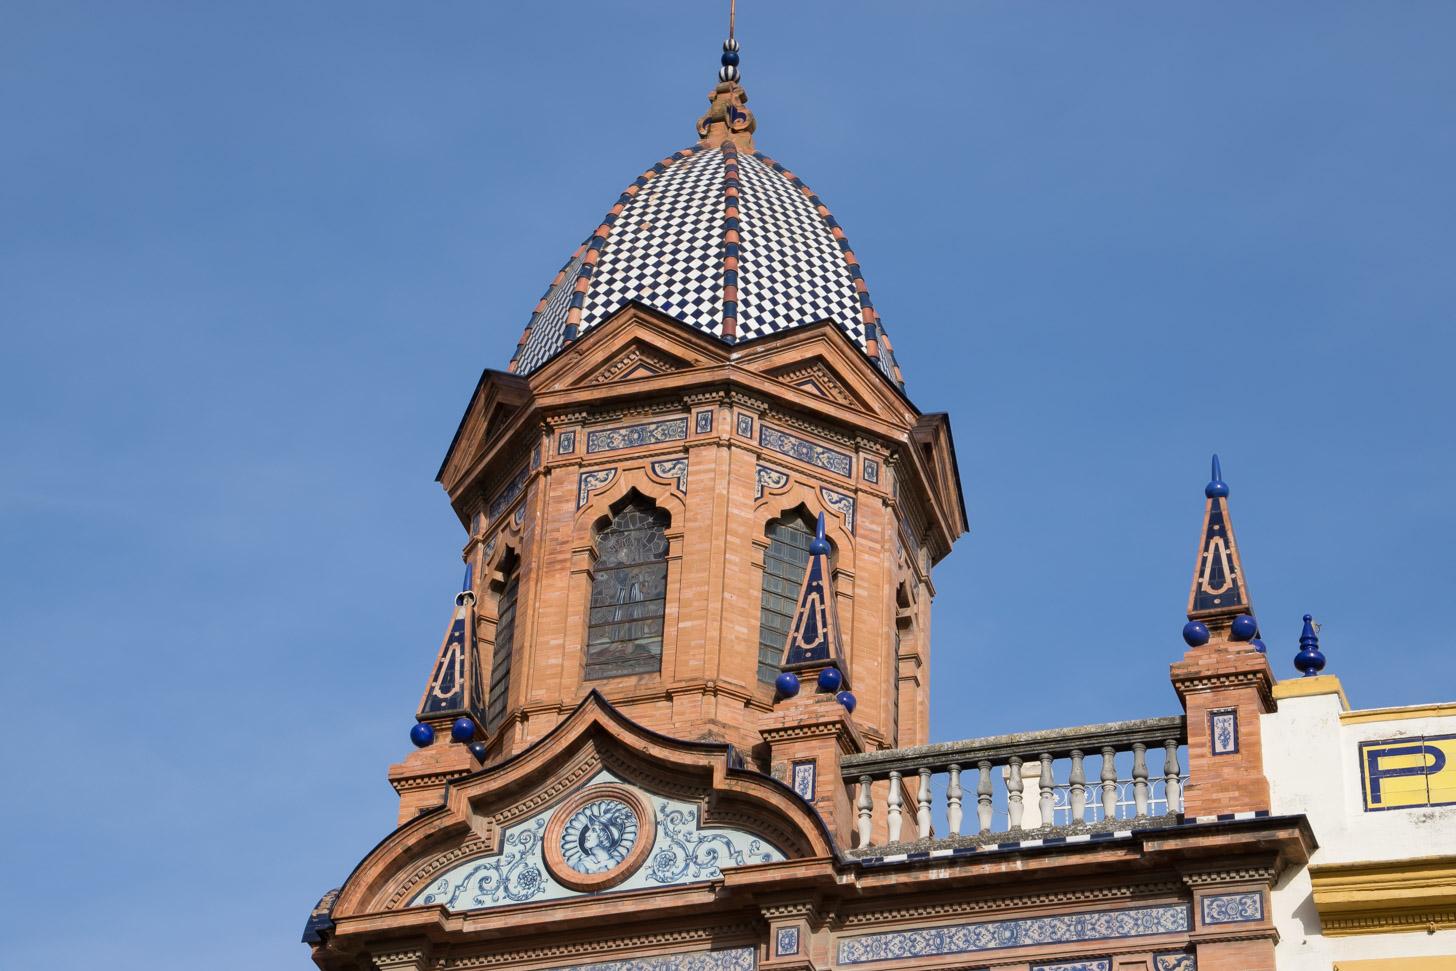 fraai torentje in Andalusische stijl